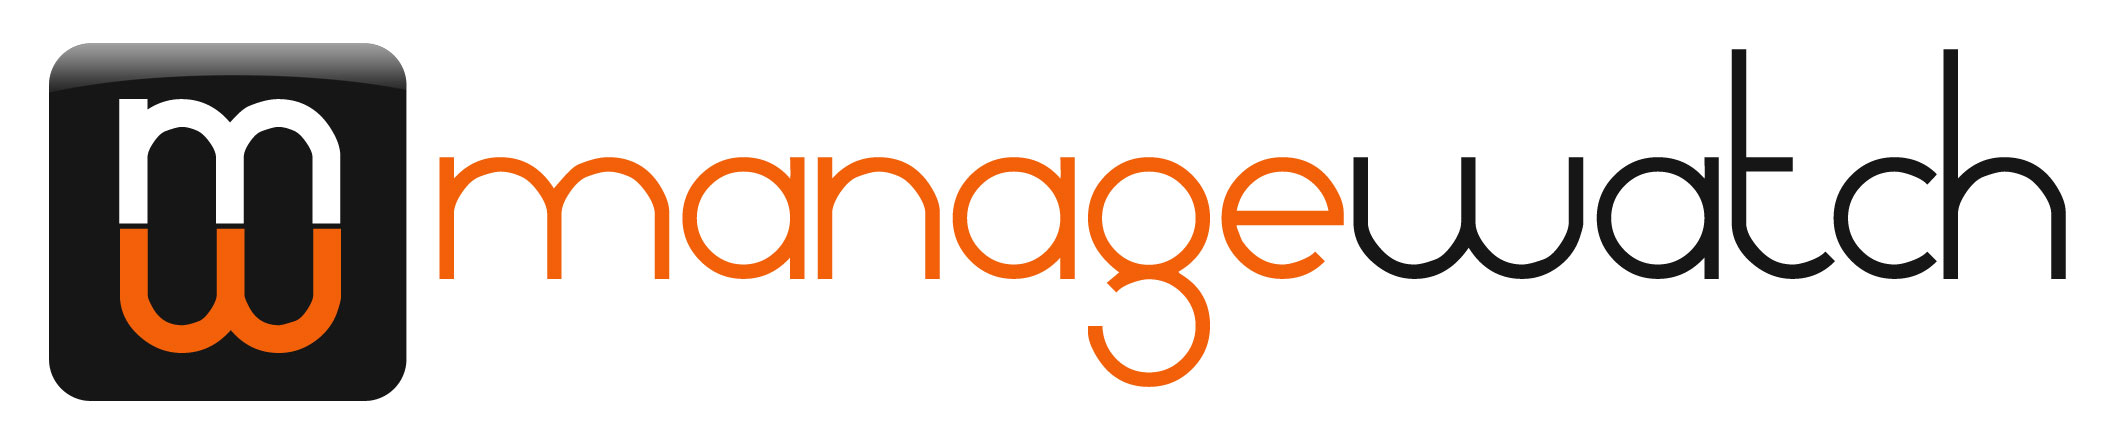 ManageWatch